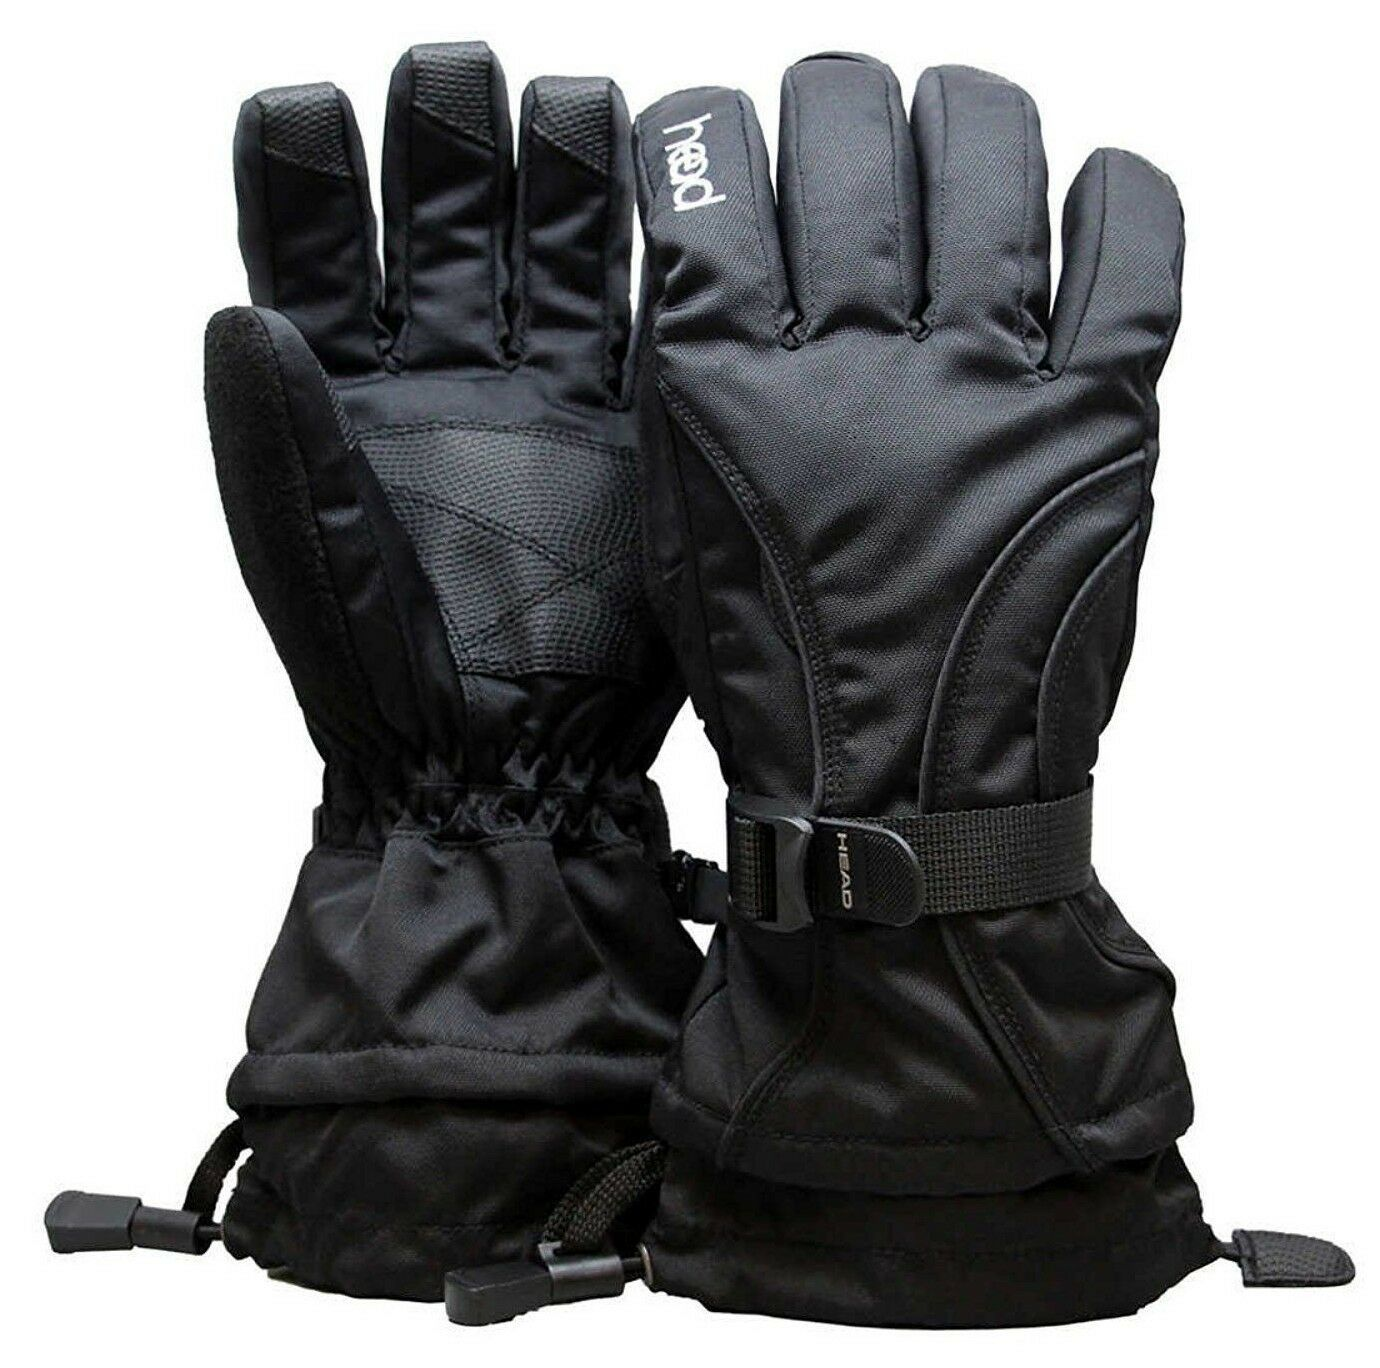 Head Junior Jr Black Insulated Ski Snowboard Winter Gloves M/6-10, L/10-14 NWT